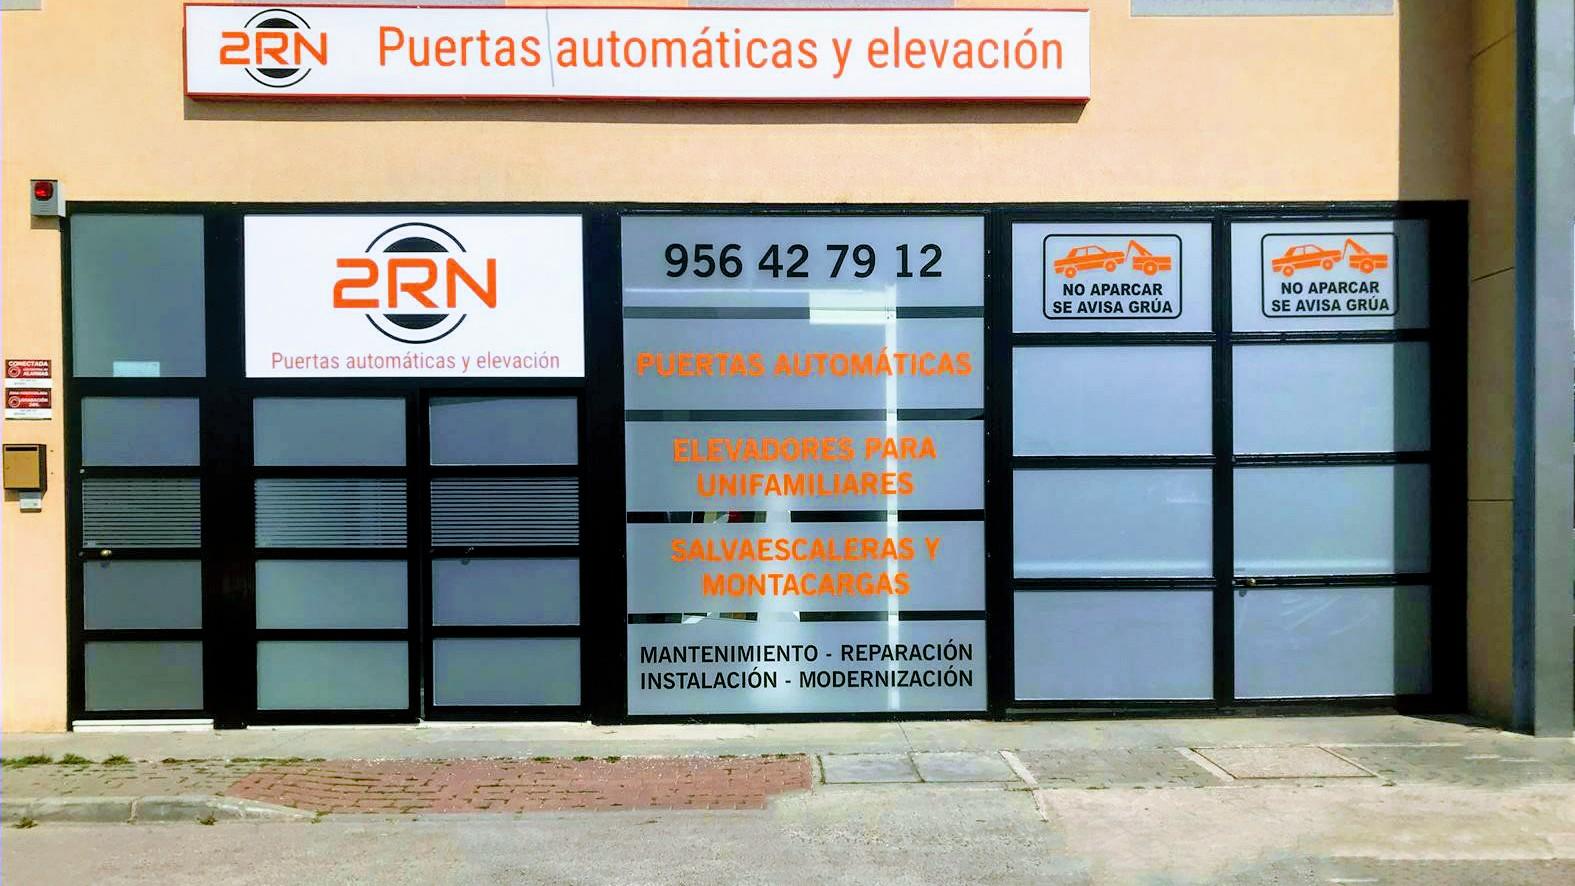 Oficinas 2RN Jerez de la Frontera